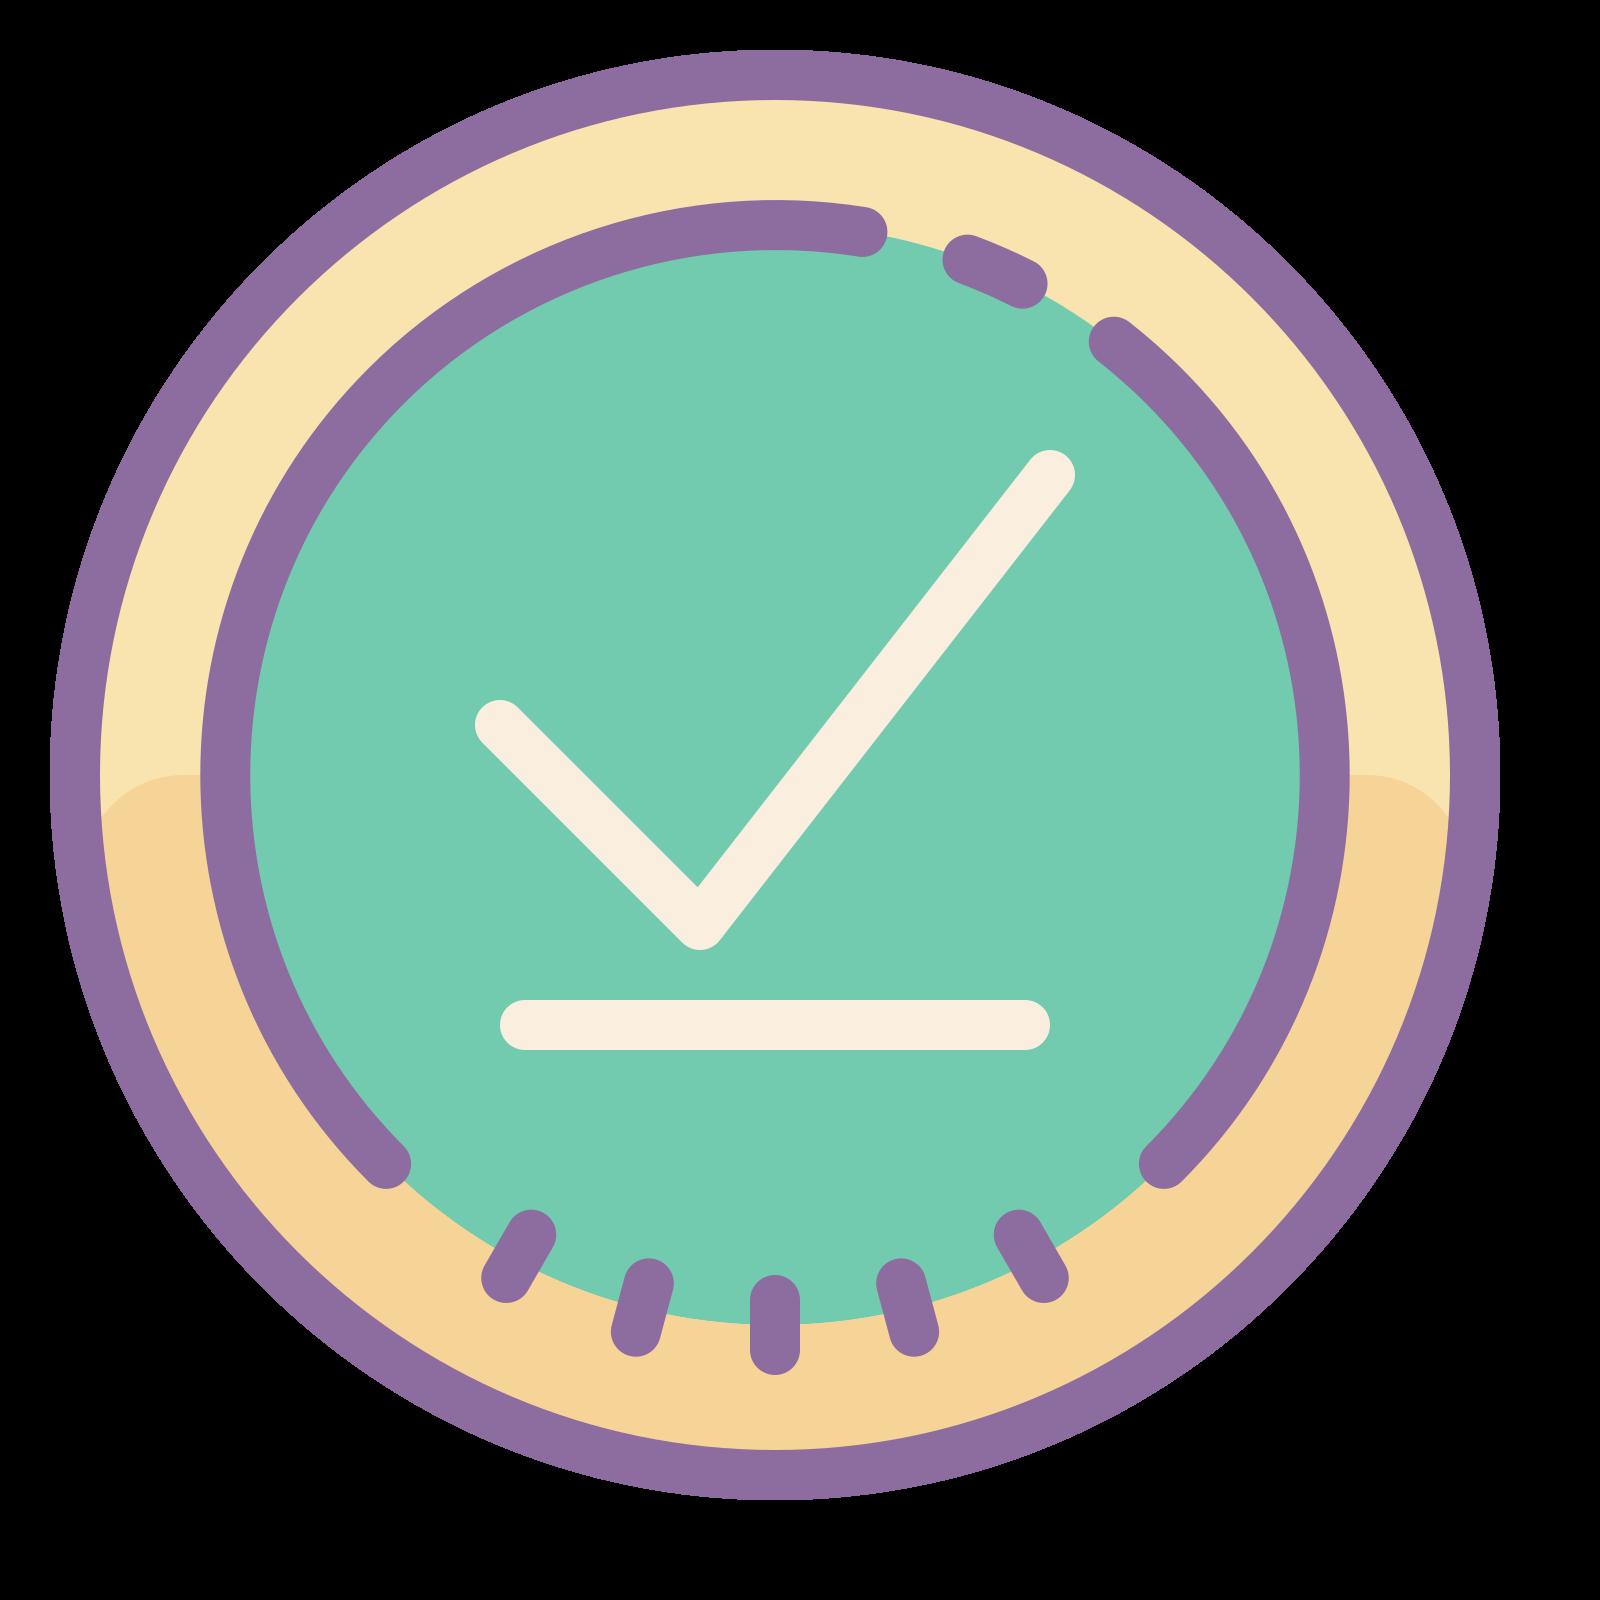 Offline Pin icon